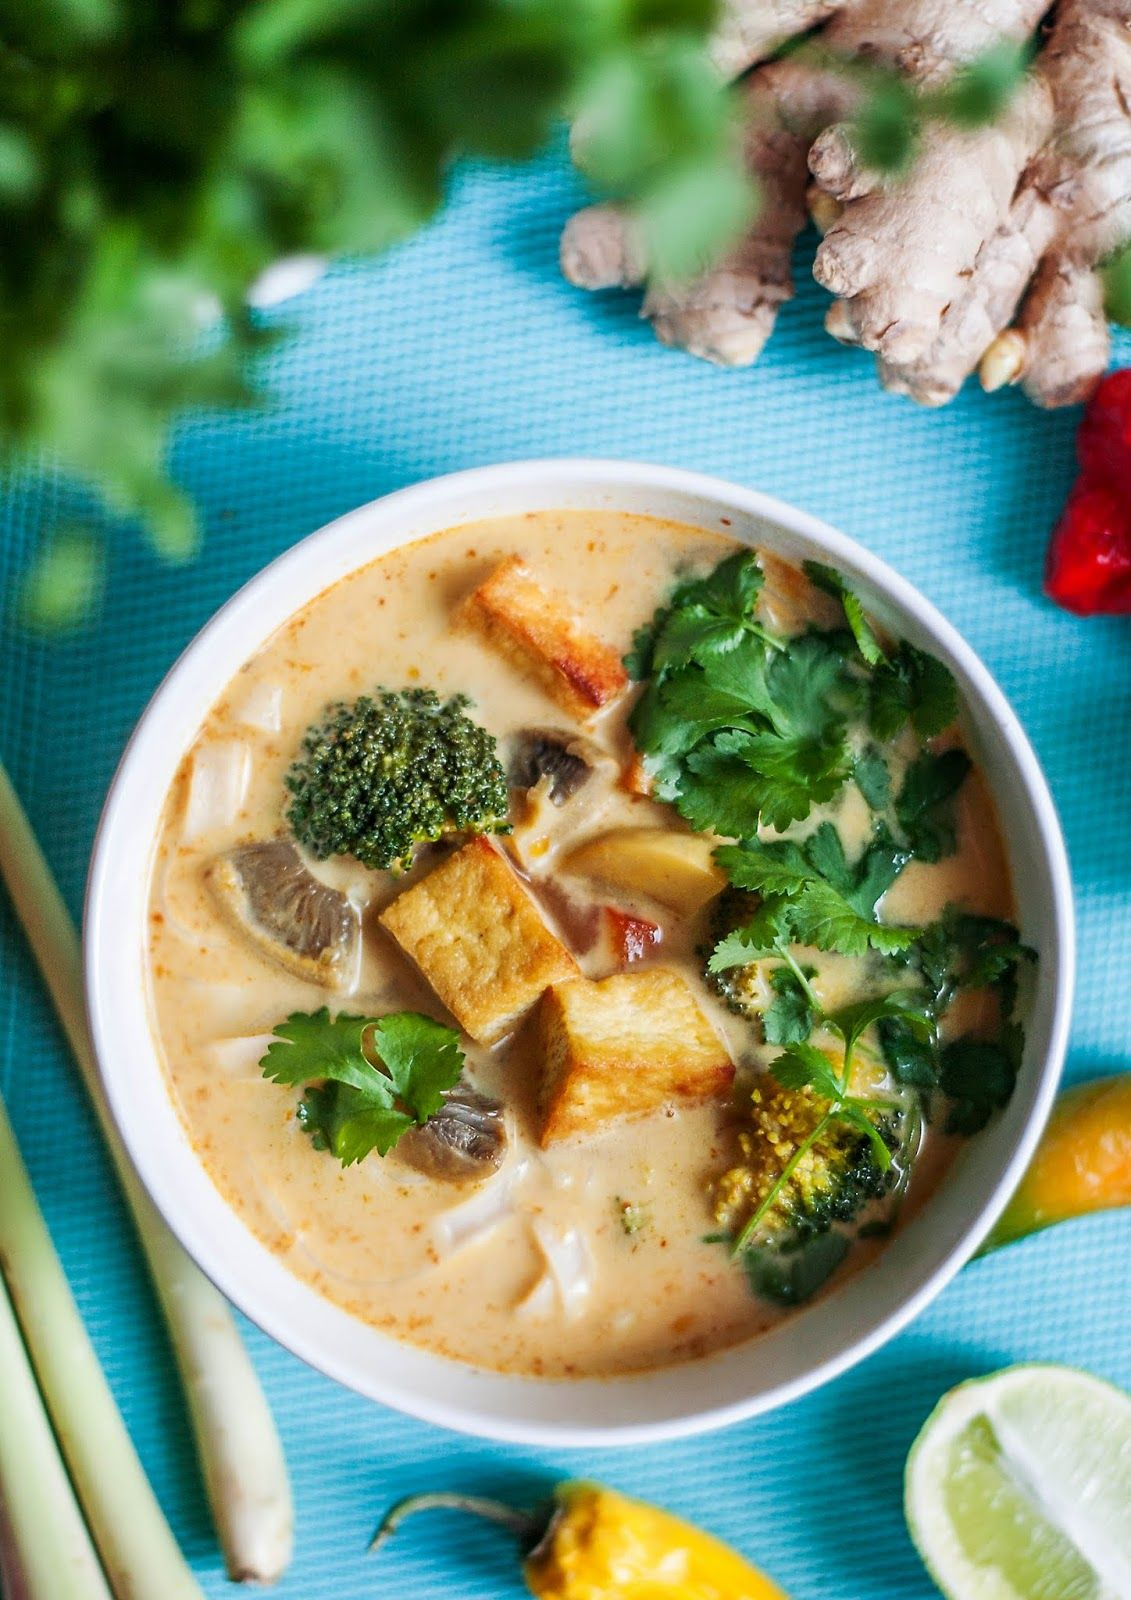 Mniumniu Kuchnia Roslinna Zupa Tajska Z Tofu I Mlekiem Kokosowym Culinary Recipes Cooking Food